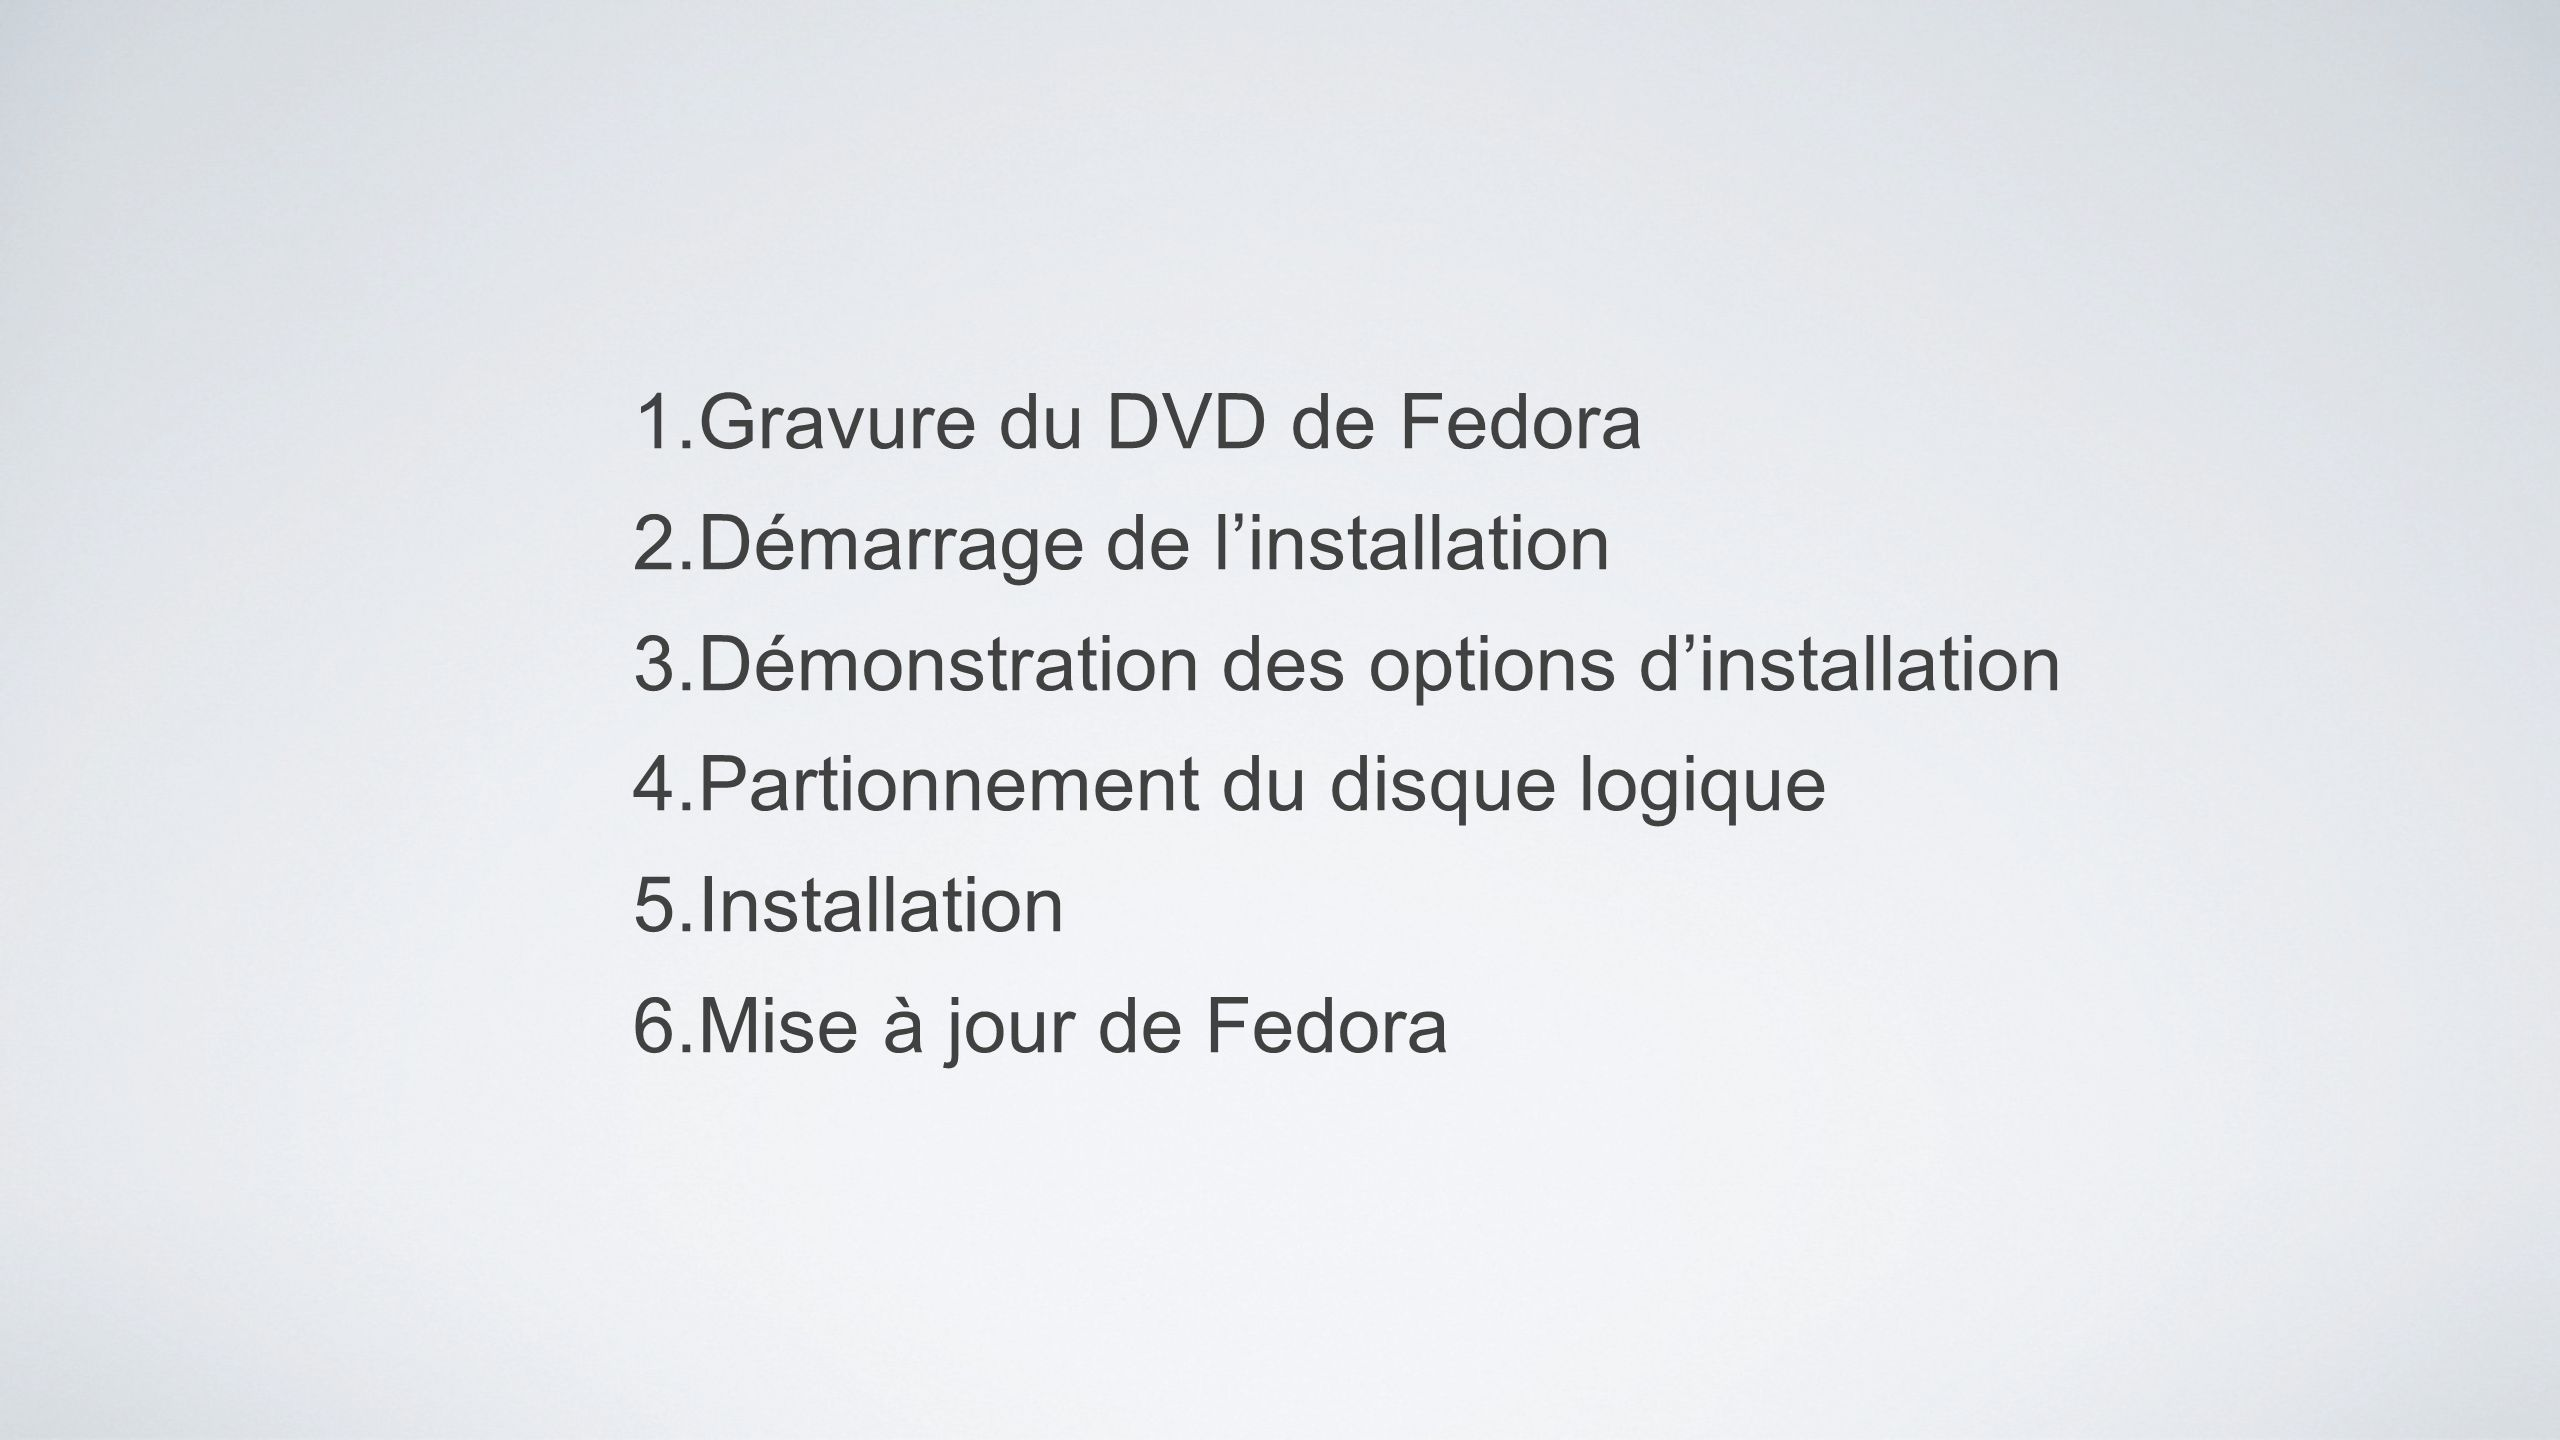 Gravure du DVD de Fedora